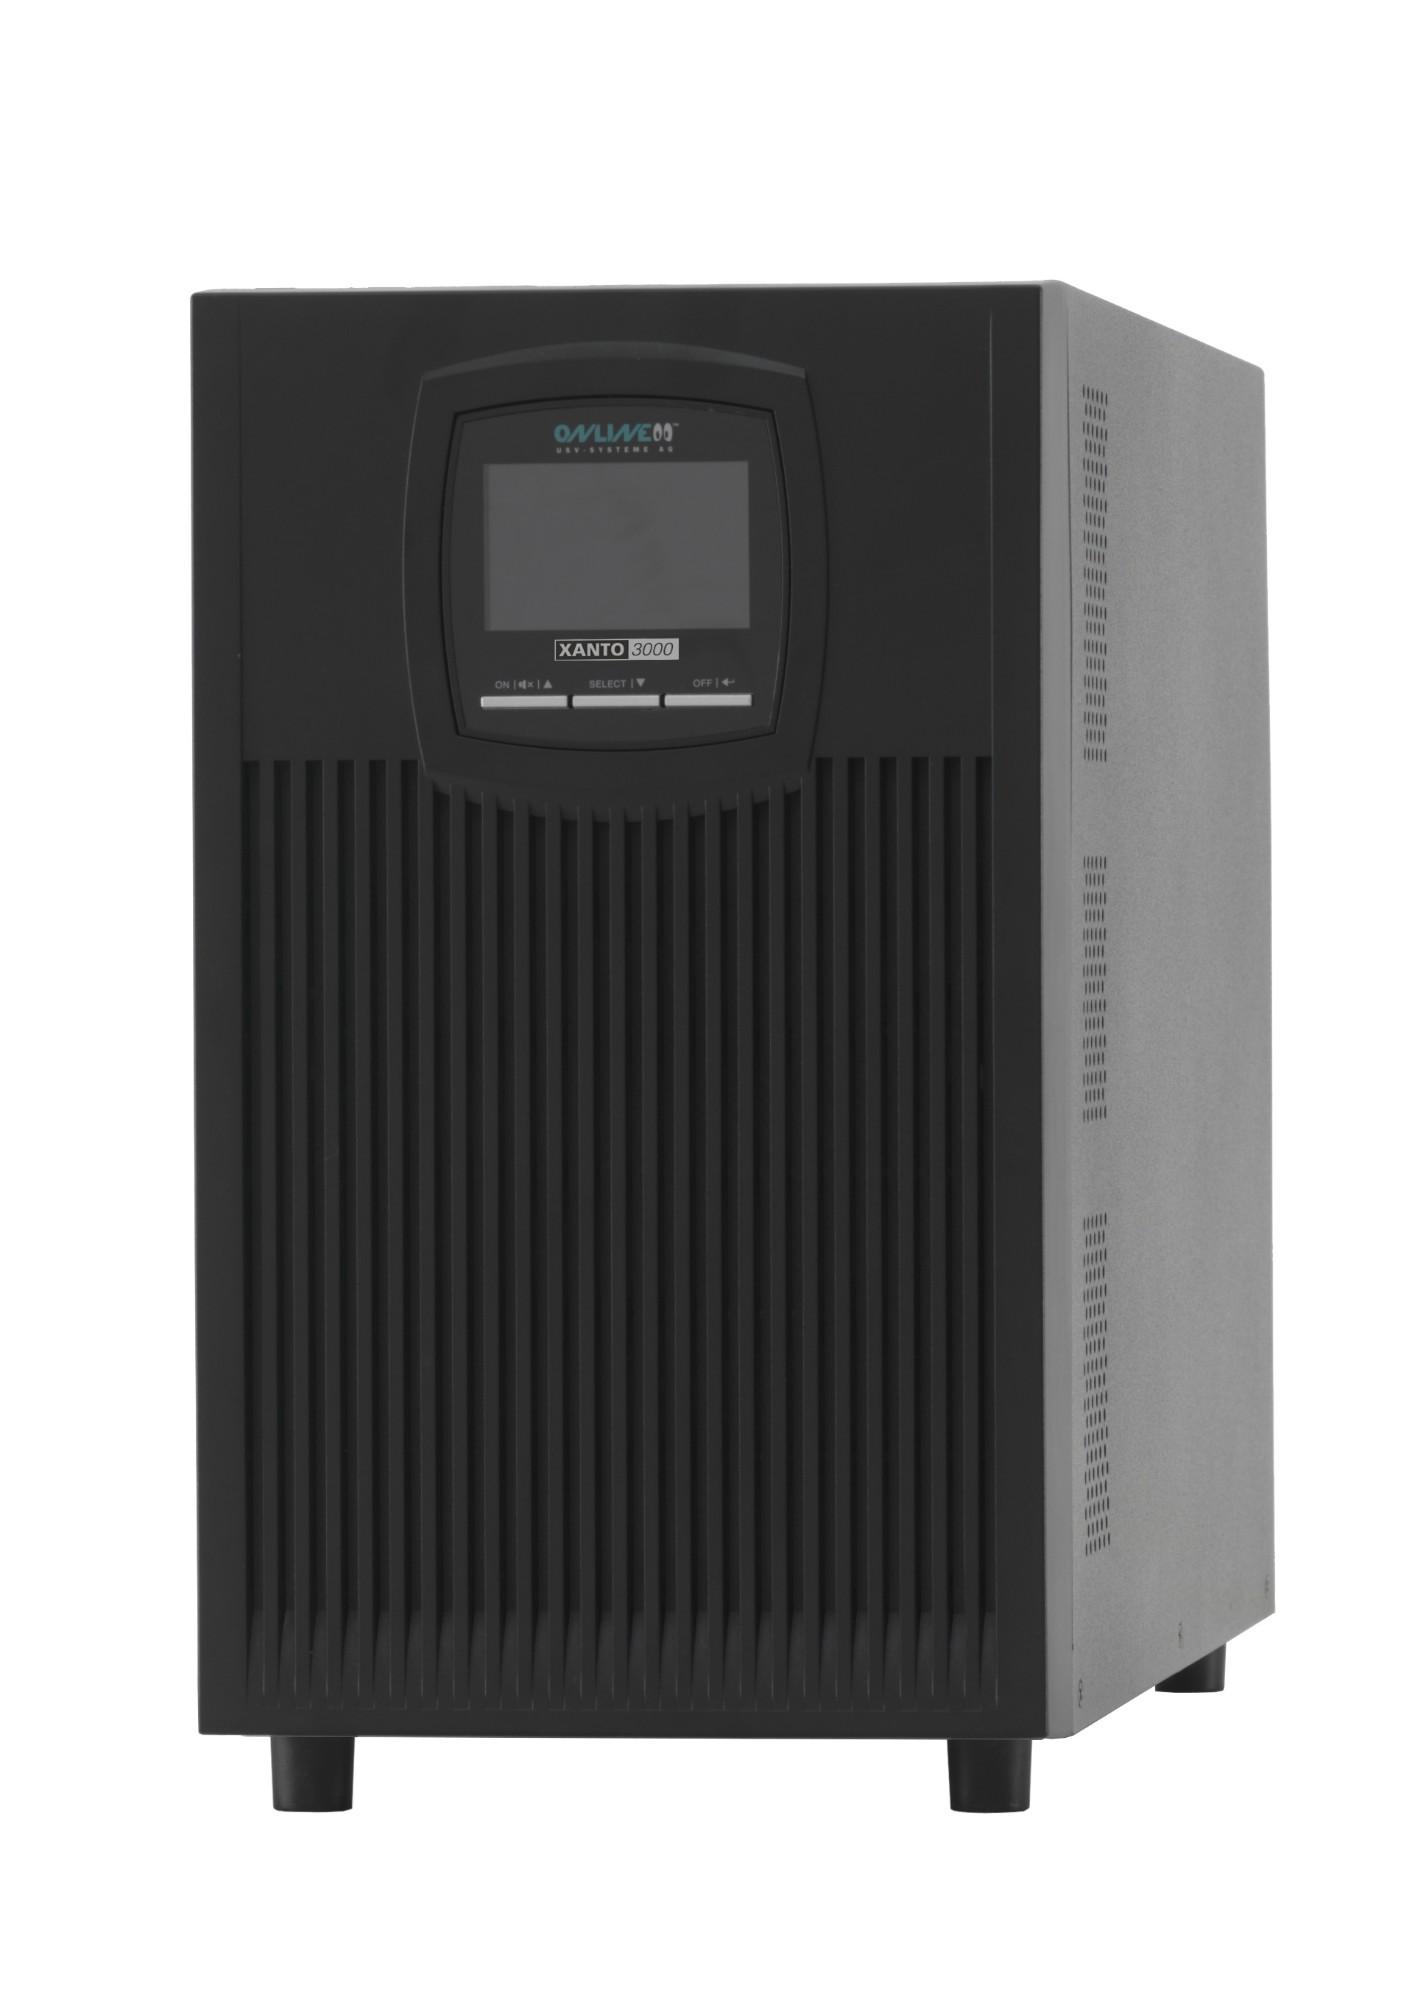 ONLINE USV-Systeme XANTO 3000 uninterruptible power supply (UPS) Double-conversion (Online) 3000 VA